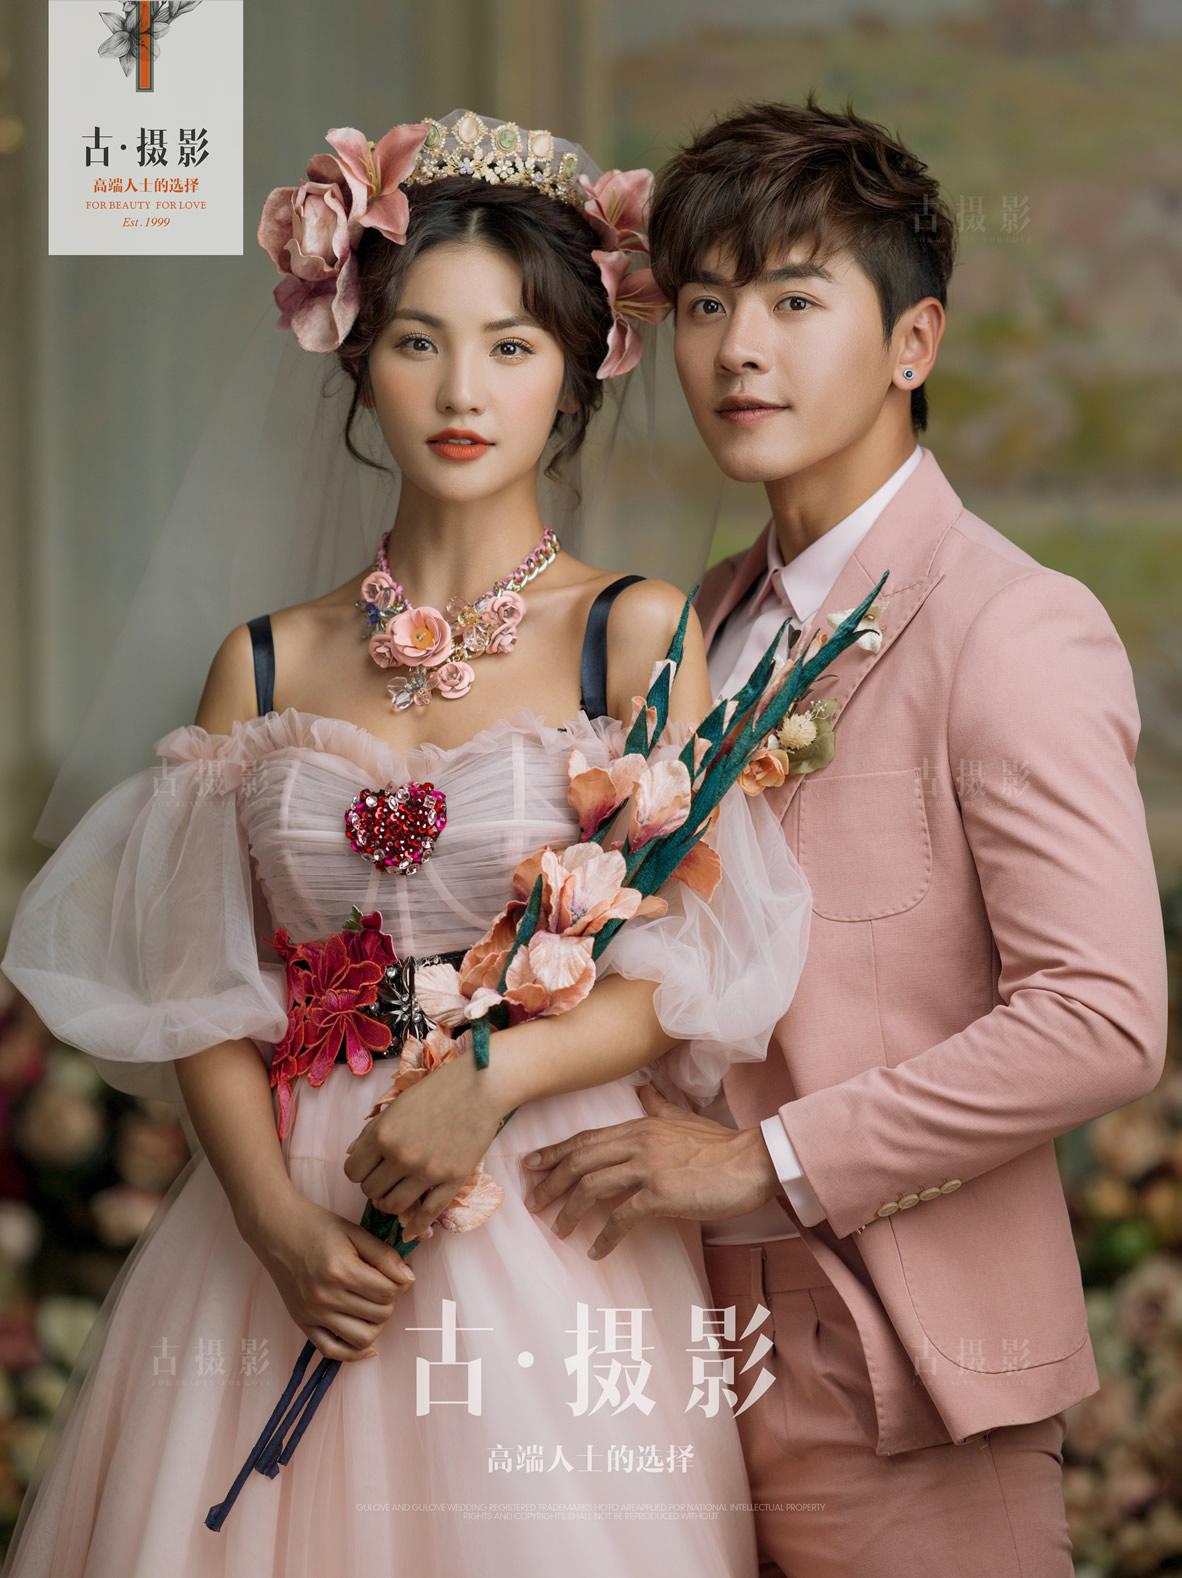 GRACE - 明星范 - love上海古摄影-上海婚纱摄影网